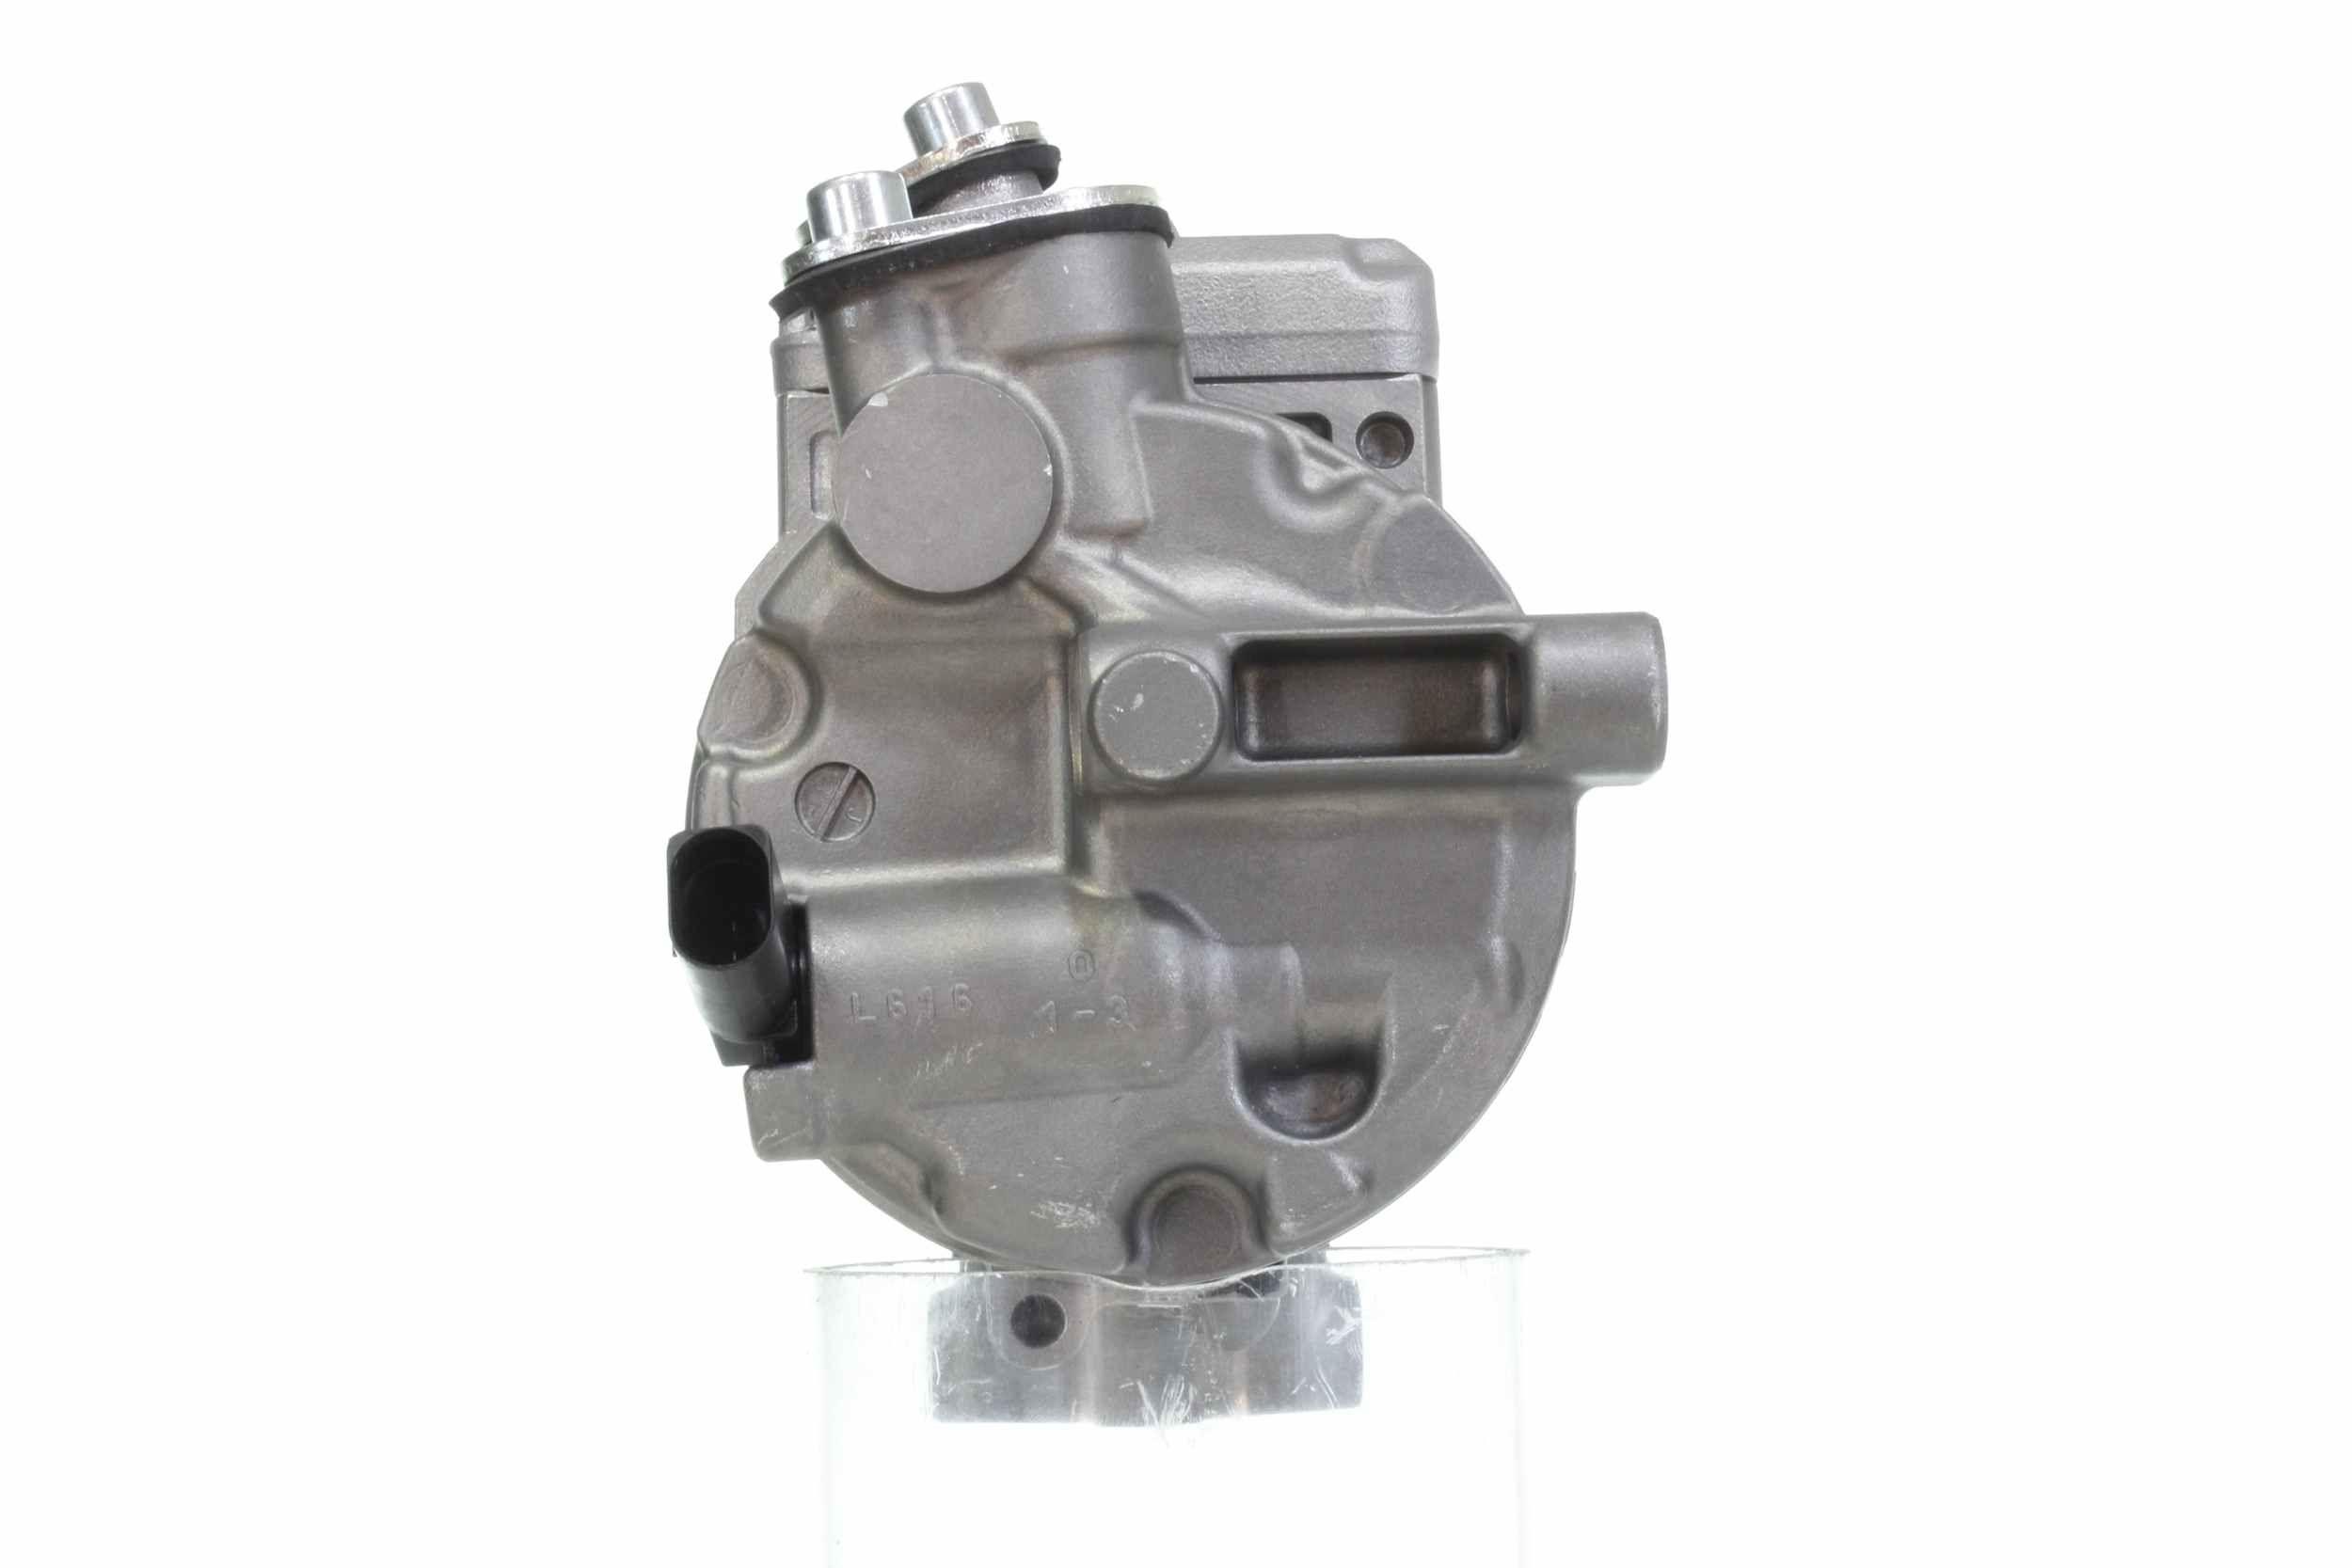 10550946 Kompressor, Klimaanlage ALANKO 550946 - Große Auswahl - stark reduziert